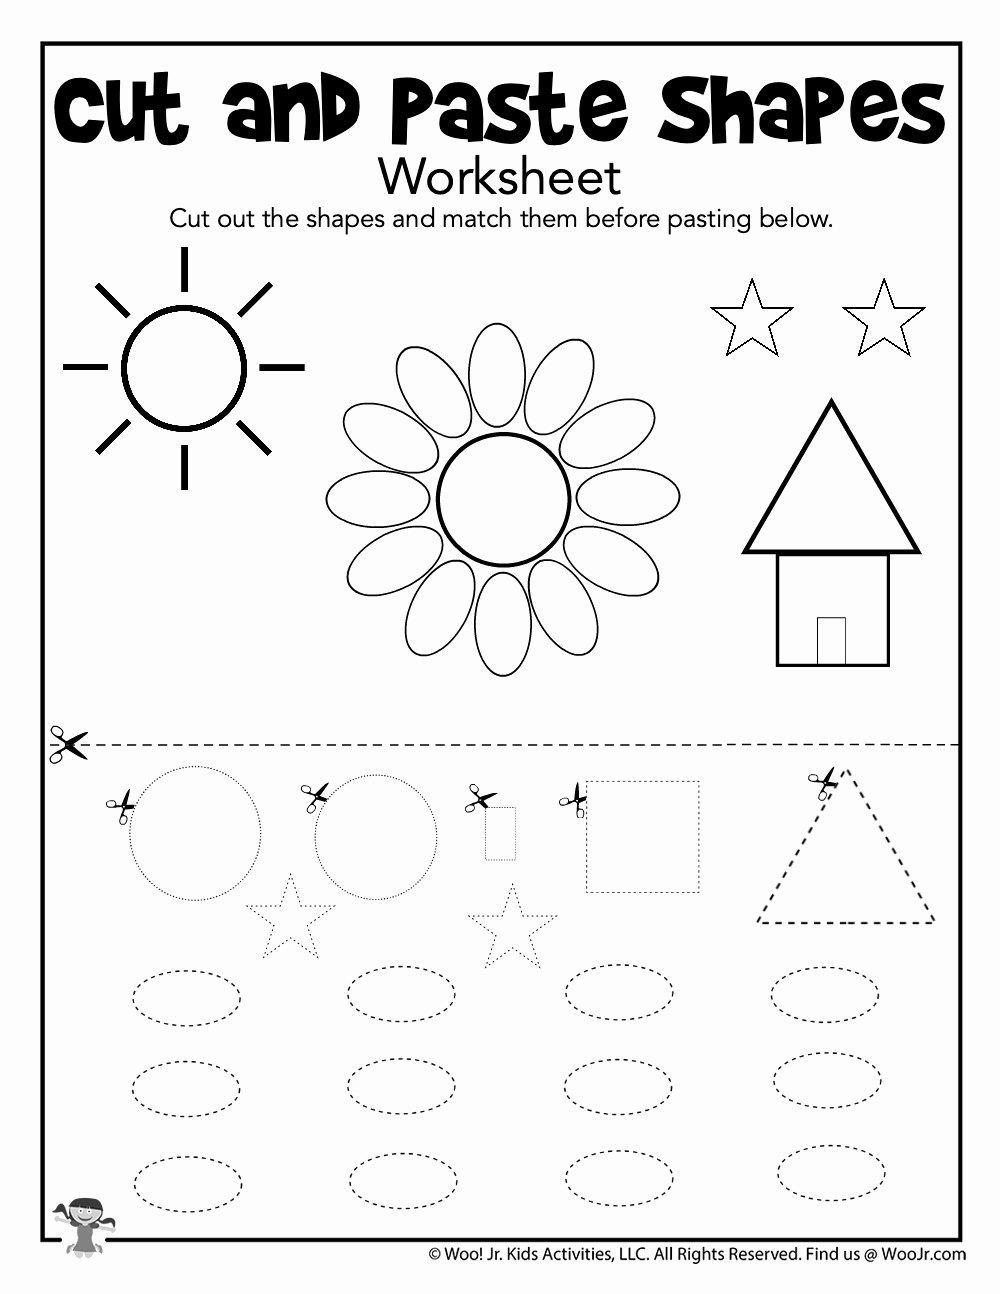 Preschool Cut and Paste Worksheets Ideas Preschool Cut and Paste Worksheet